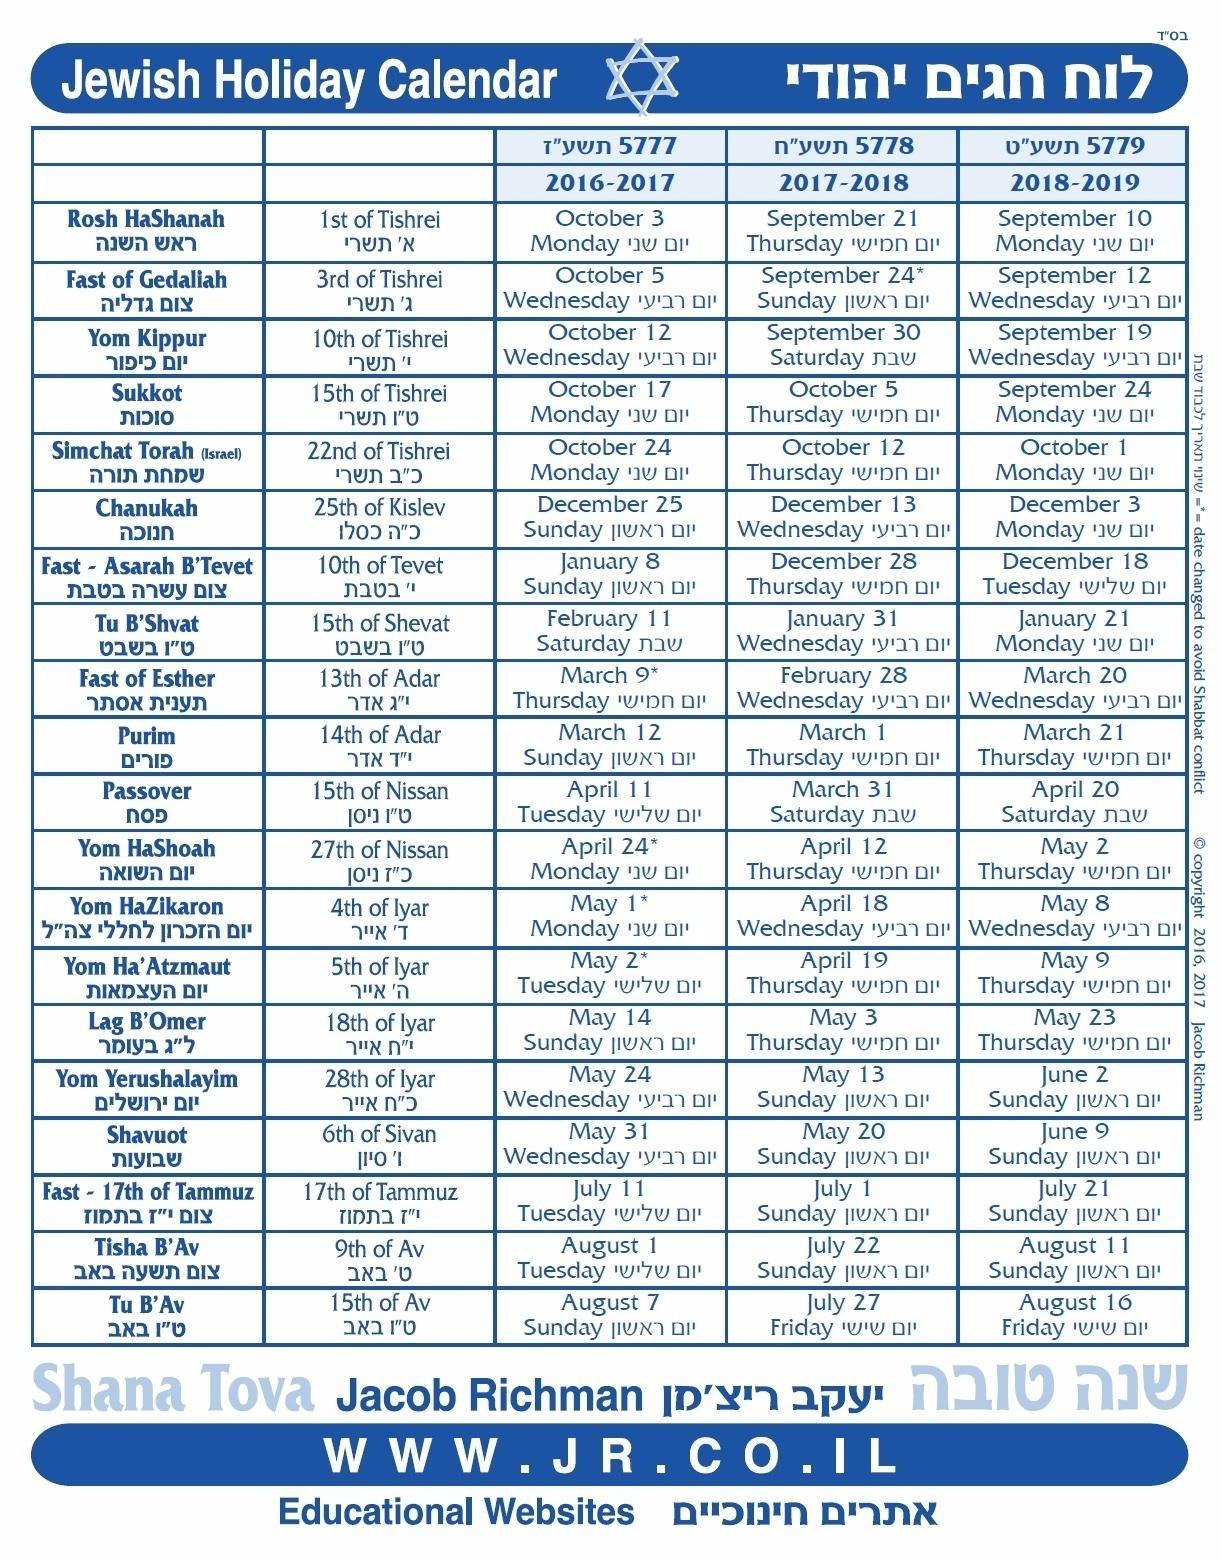 Good News From Israel: 3 Year Jewish Holiday Calendar: 5777-5779